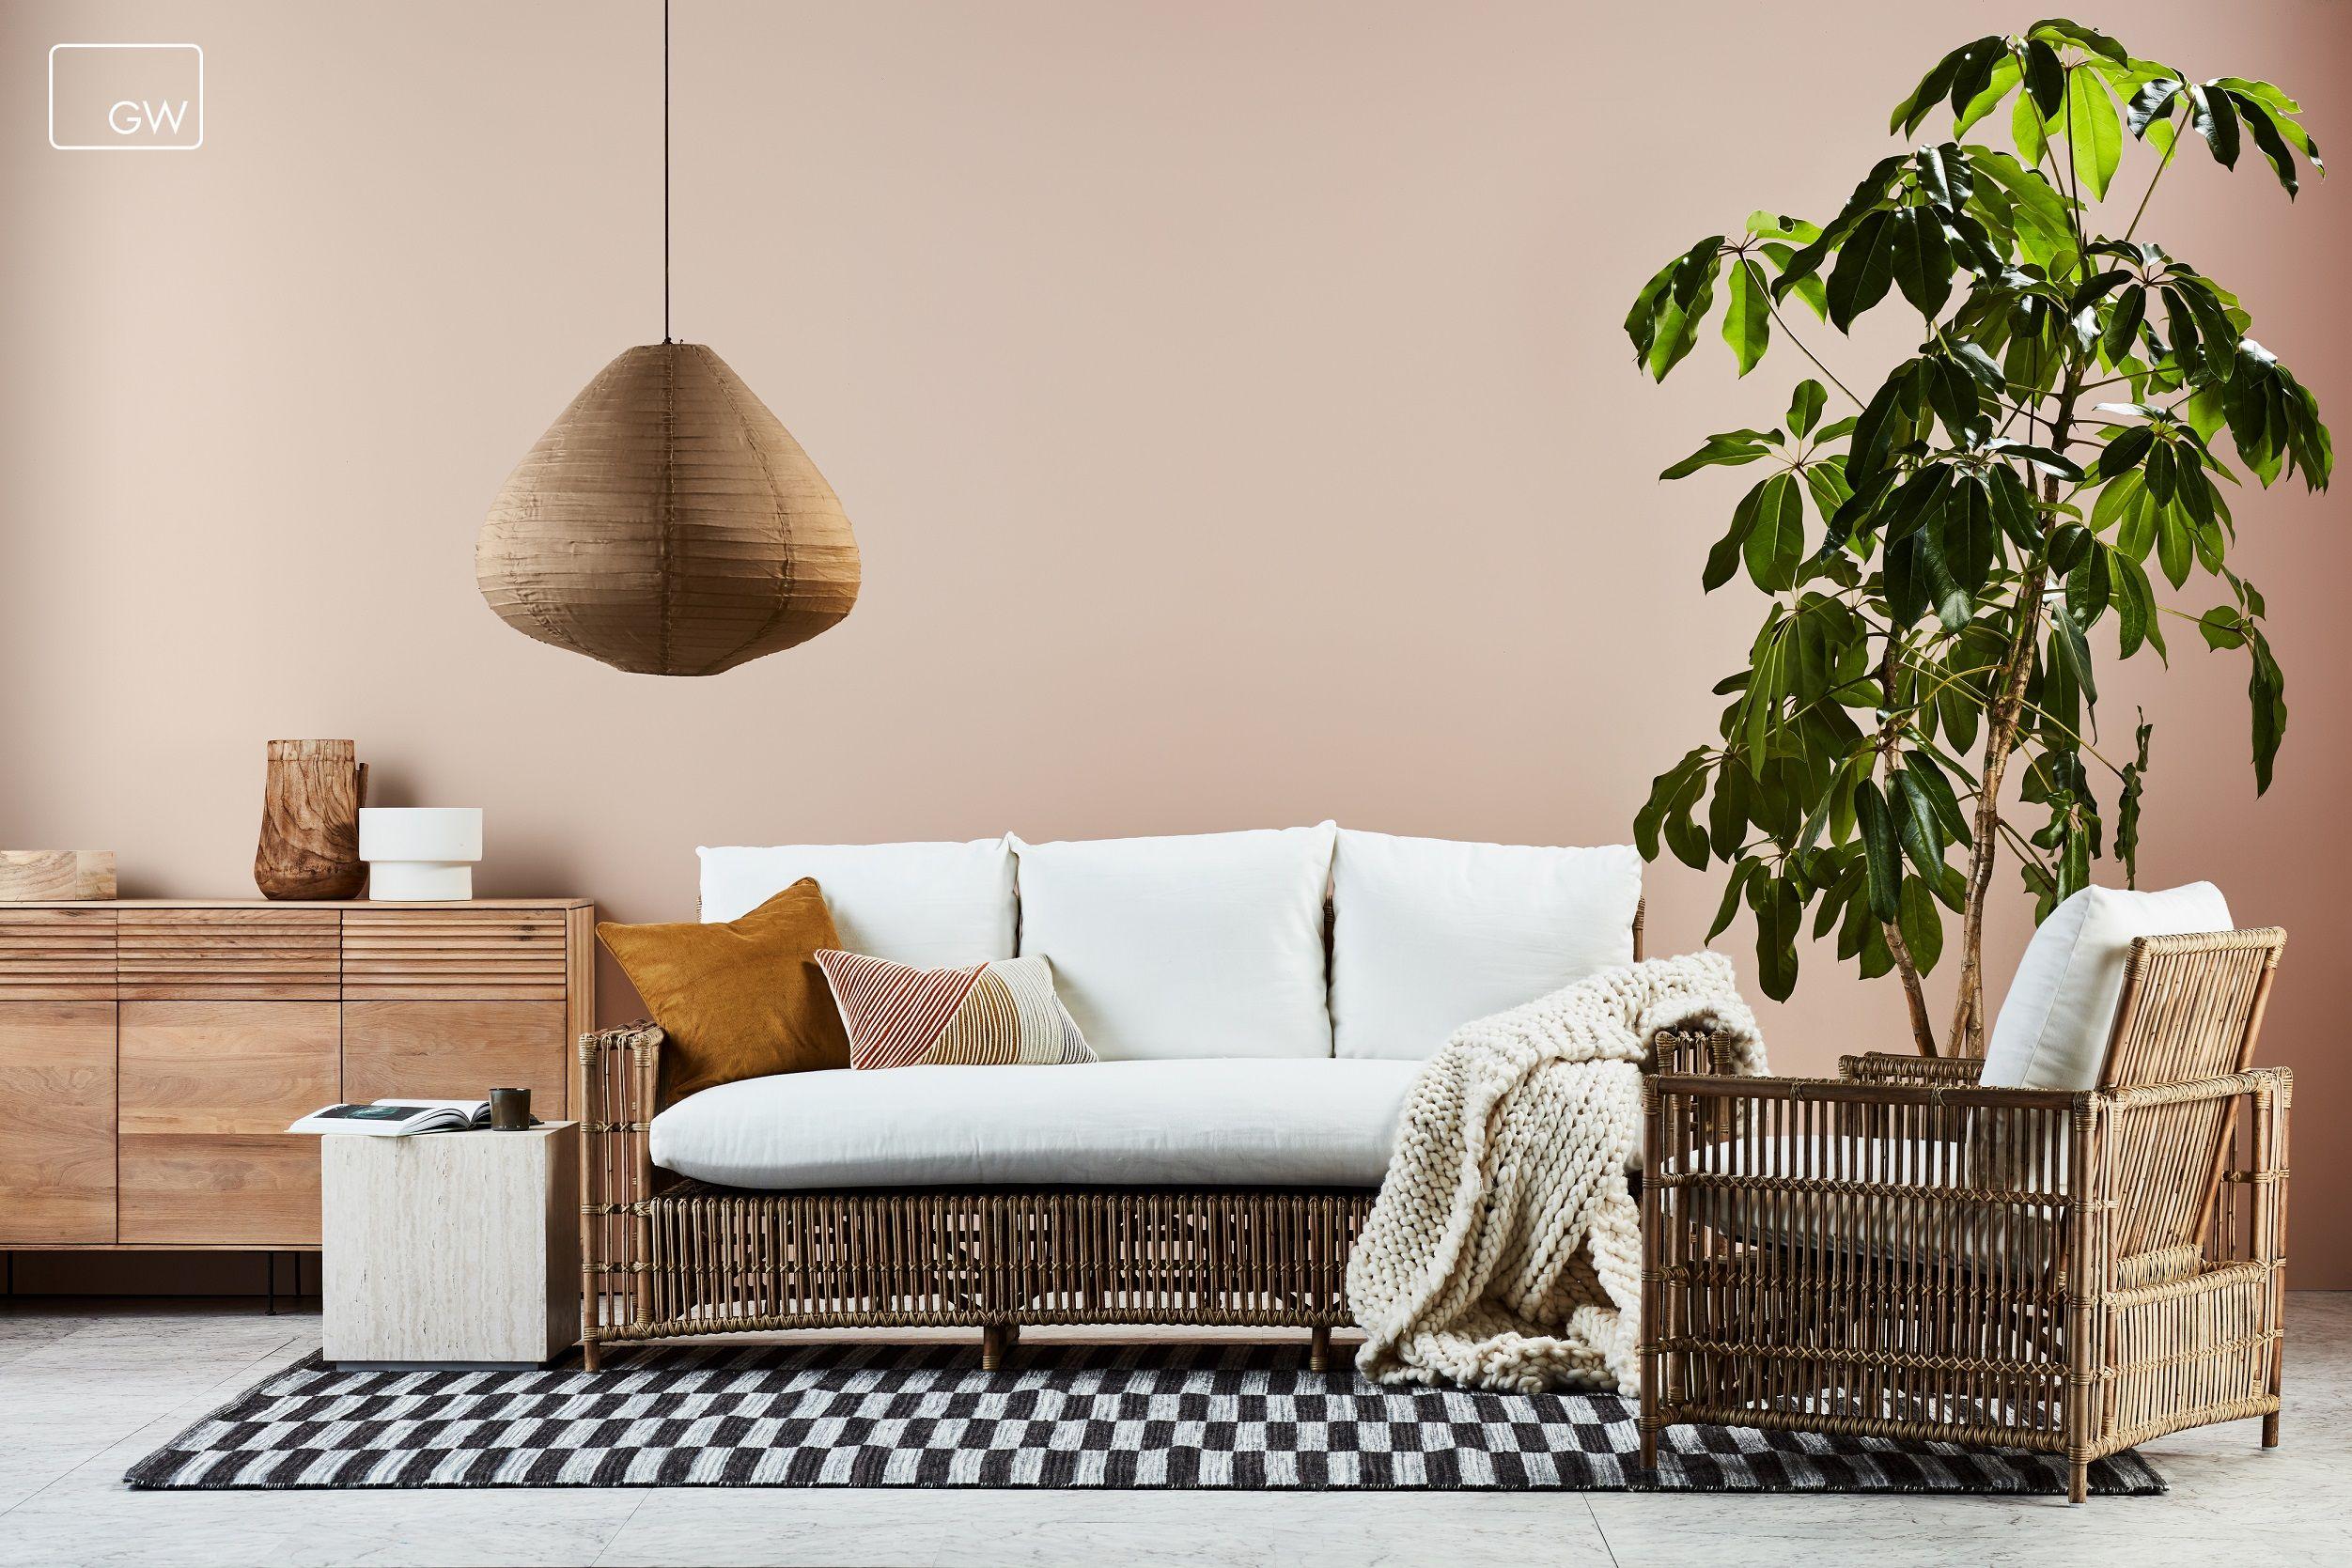 Featuring: Plantation Sofa Chair, Plantation 3 Seater Sofa, Linea Etch  Buffet, Elle